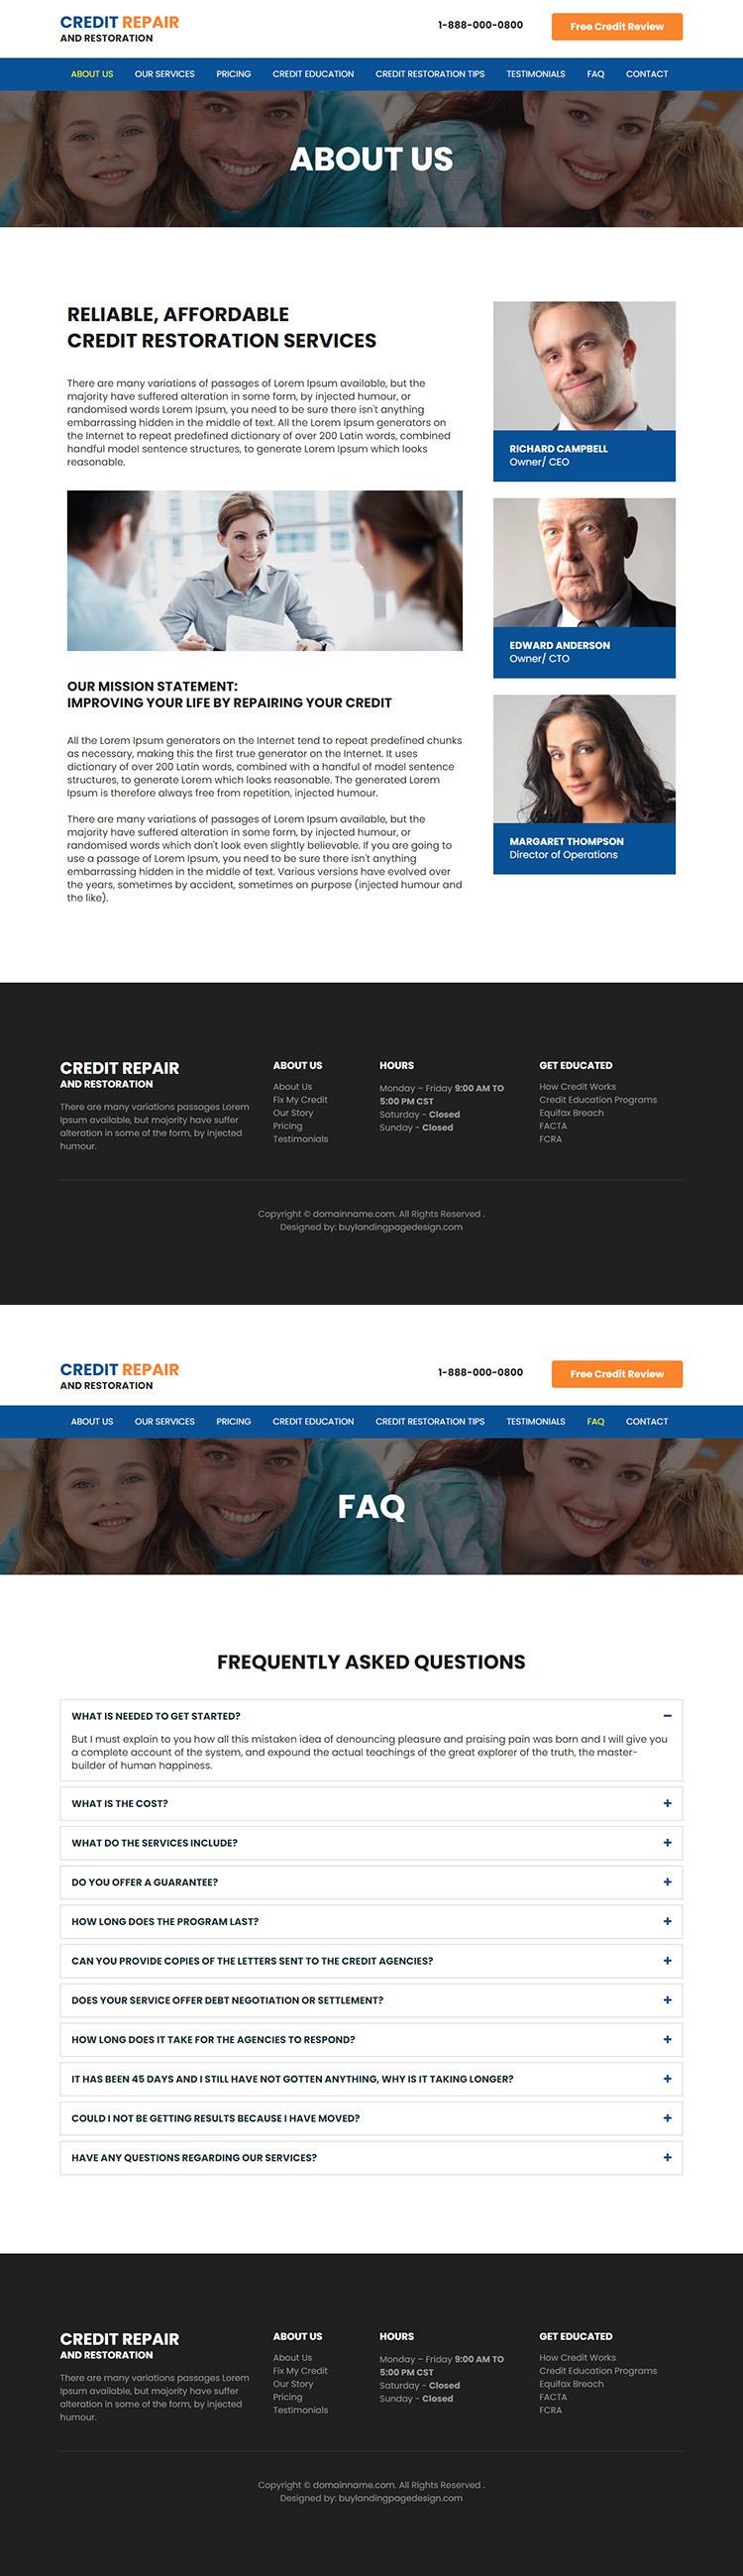 credit repair and restoration service responsive website design